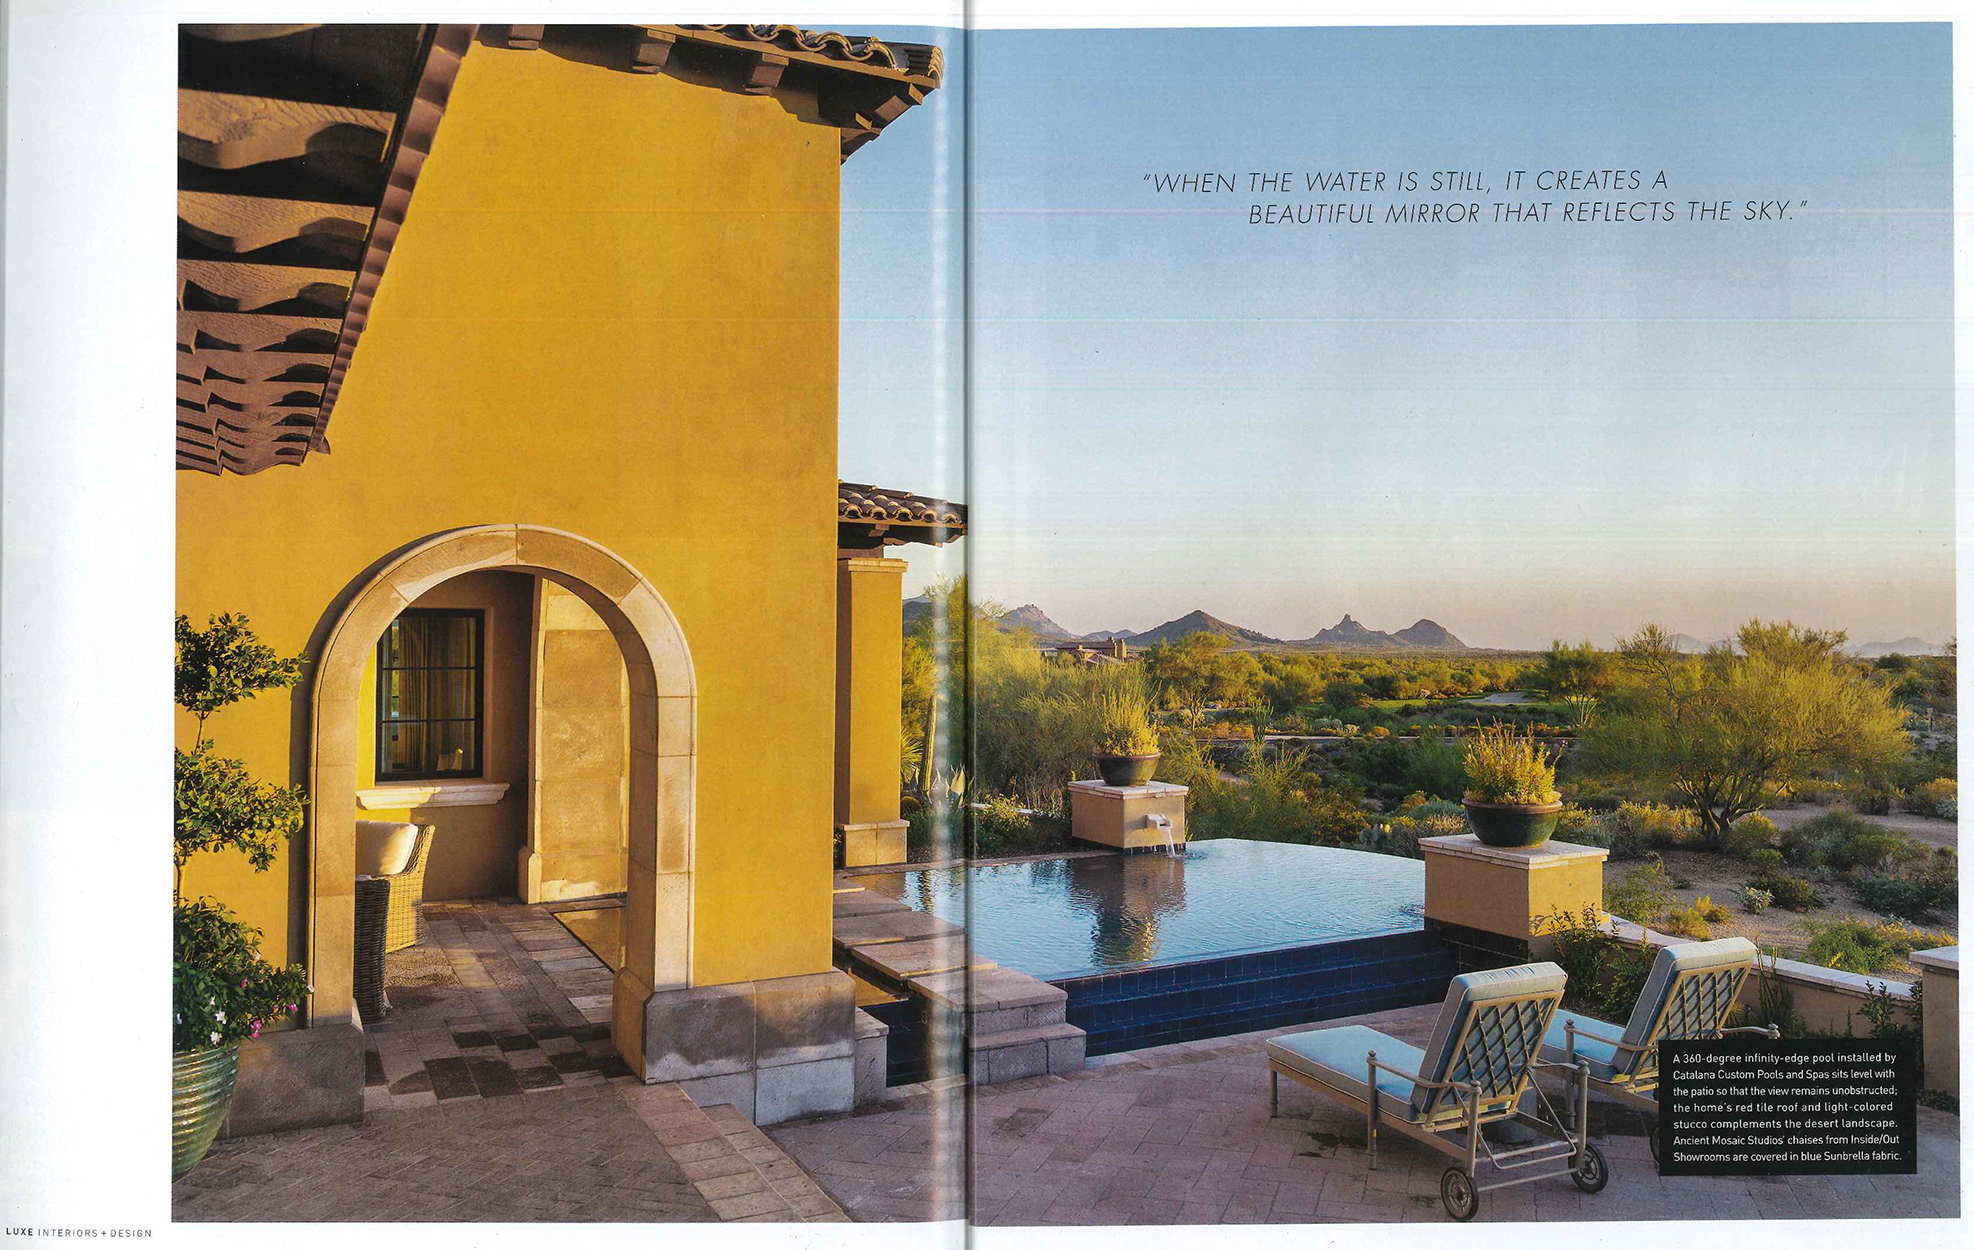 Custom home of the year, desert flair article